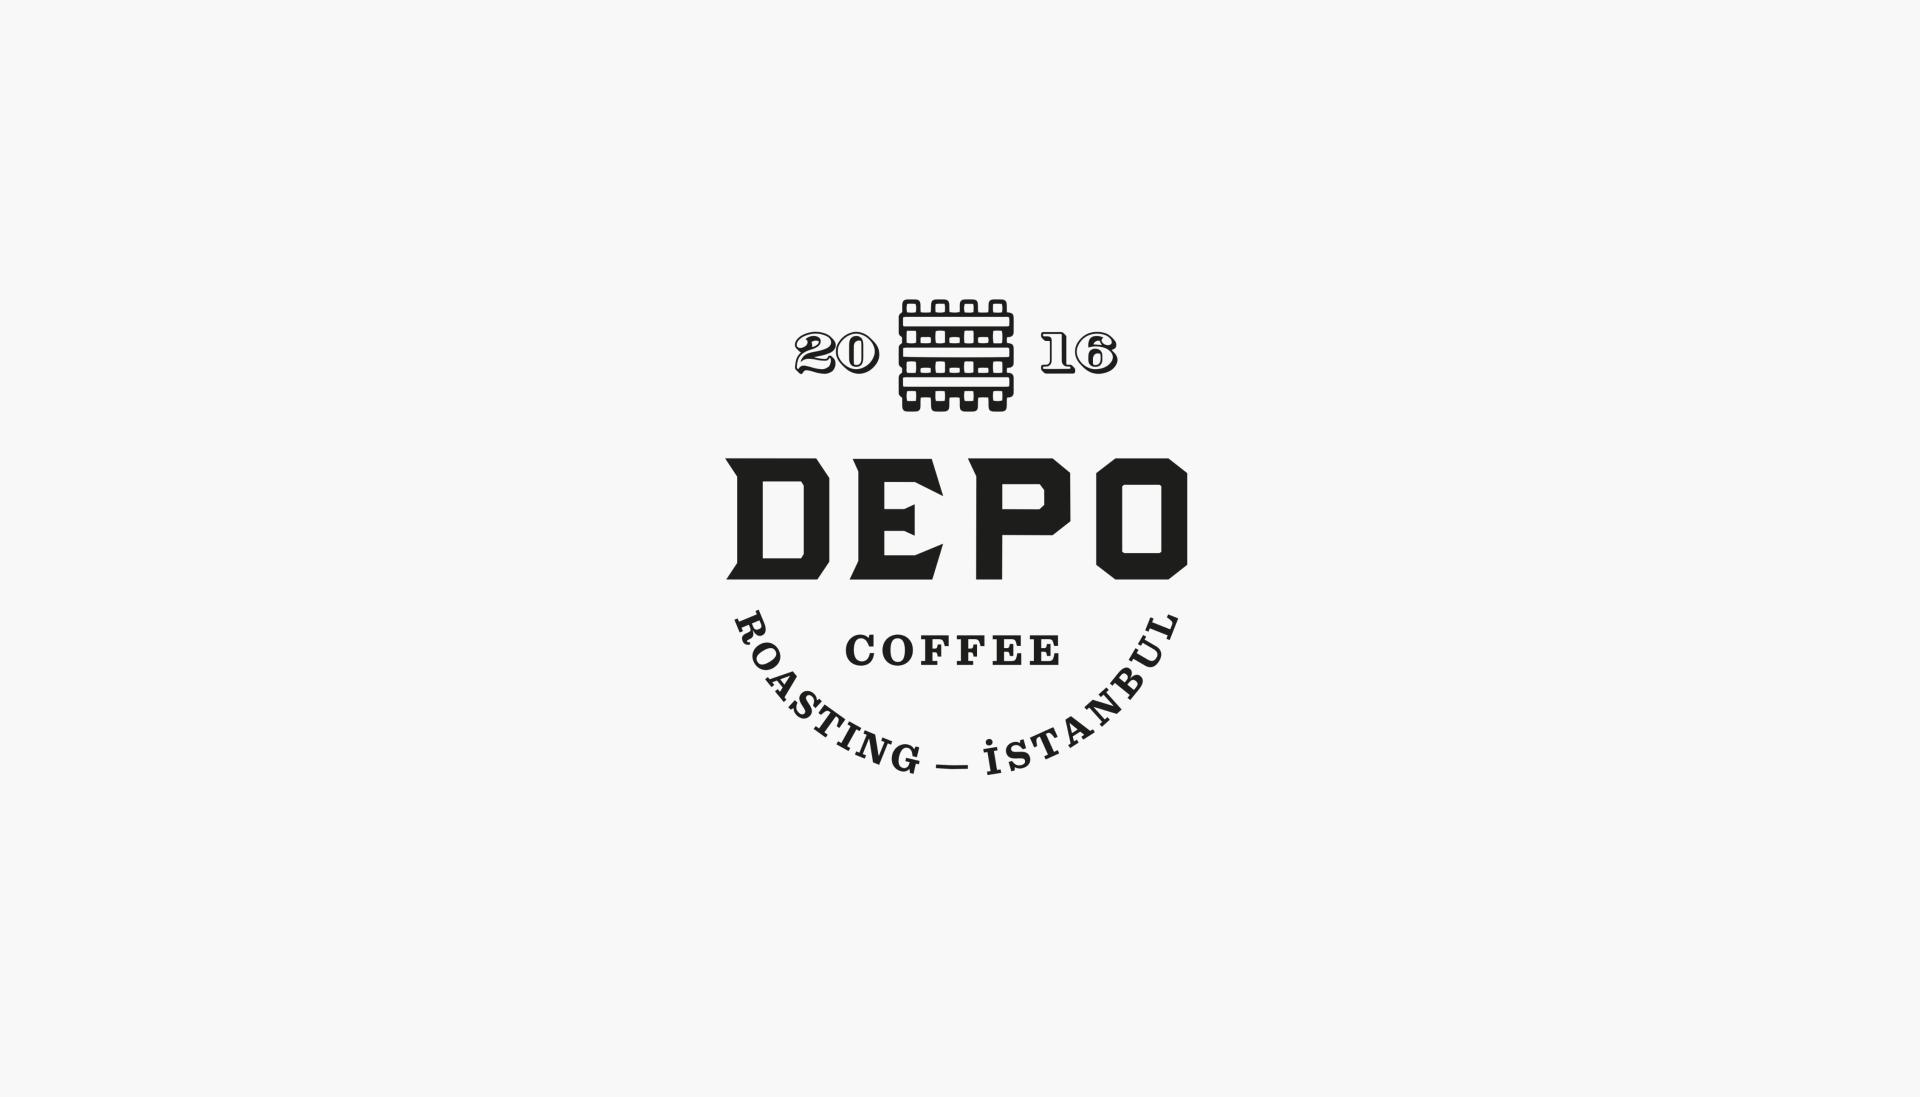 depo-logo-istanbul-coffee-roasting-istanbul-zeki-michael-design-agency-branding-design-roaster.jpg